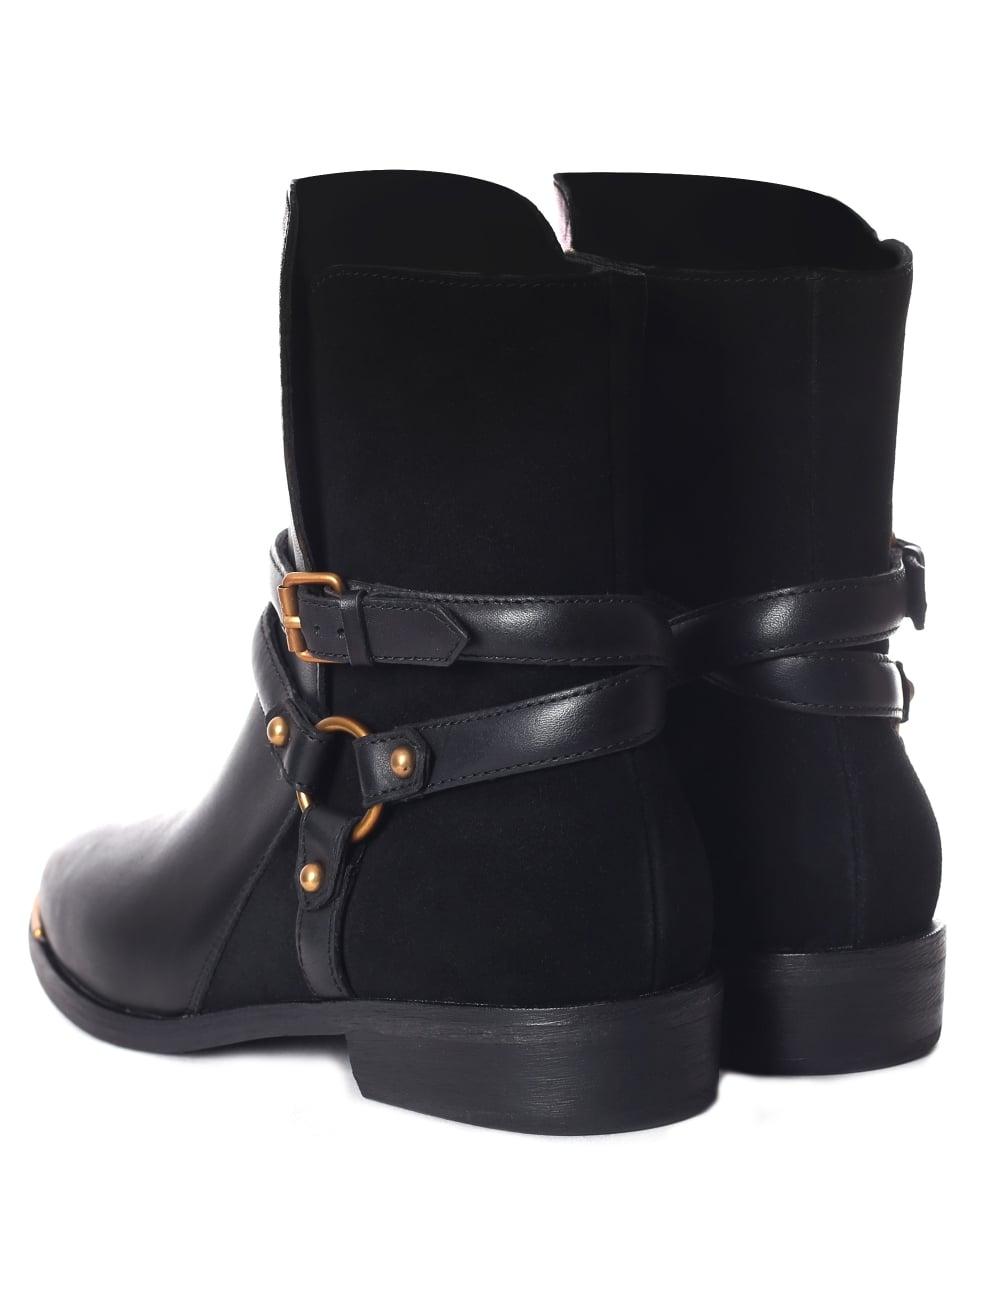 28e628ad9a51 Women  039 s Kelby Boot